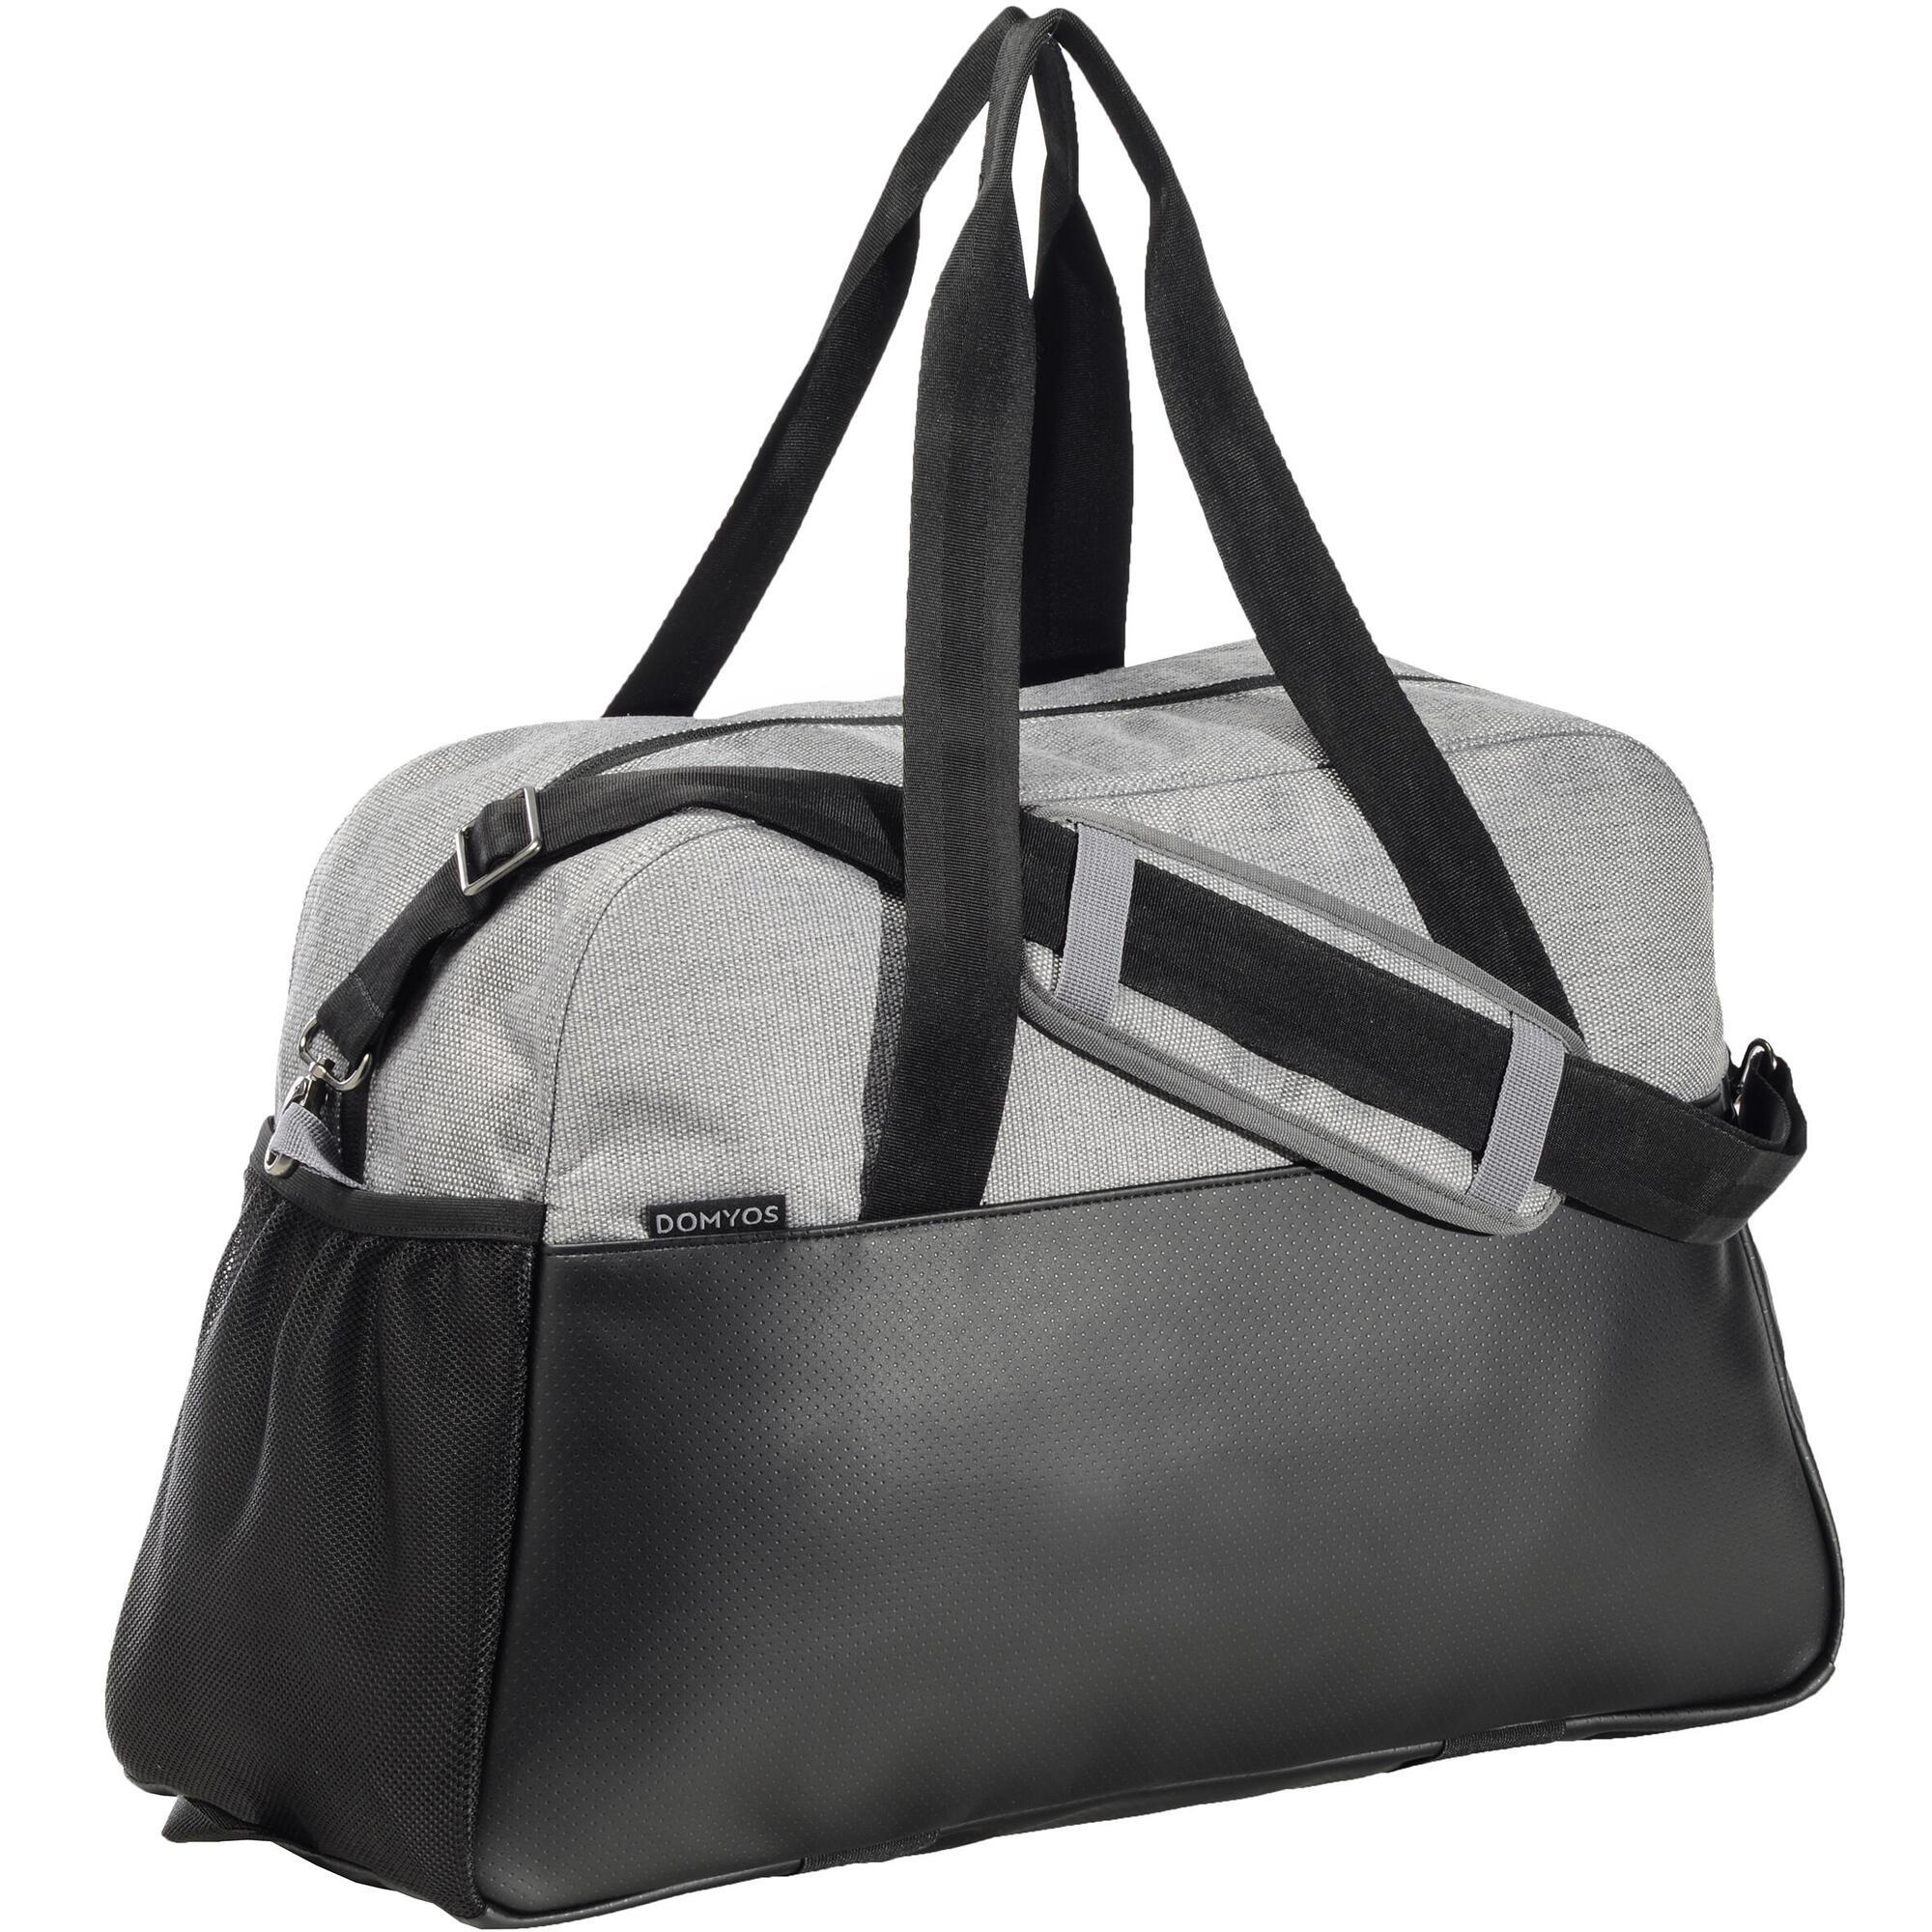 sac fitness 30 litres gris et noir premium domyos by decathlon. Black Bedroom Furniture Sets. Home Design Ideas